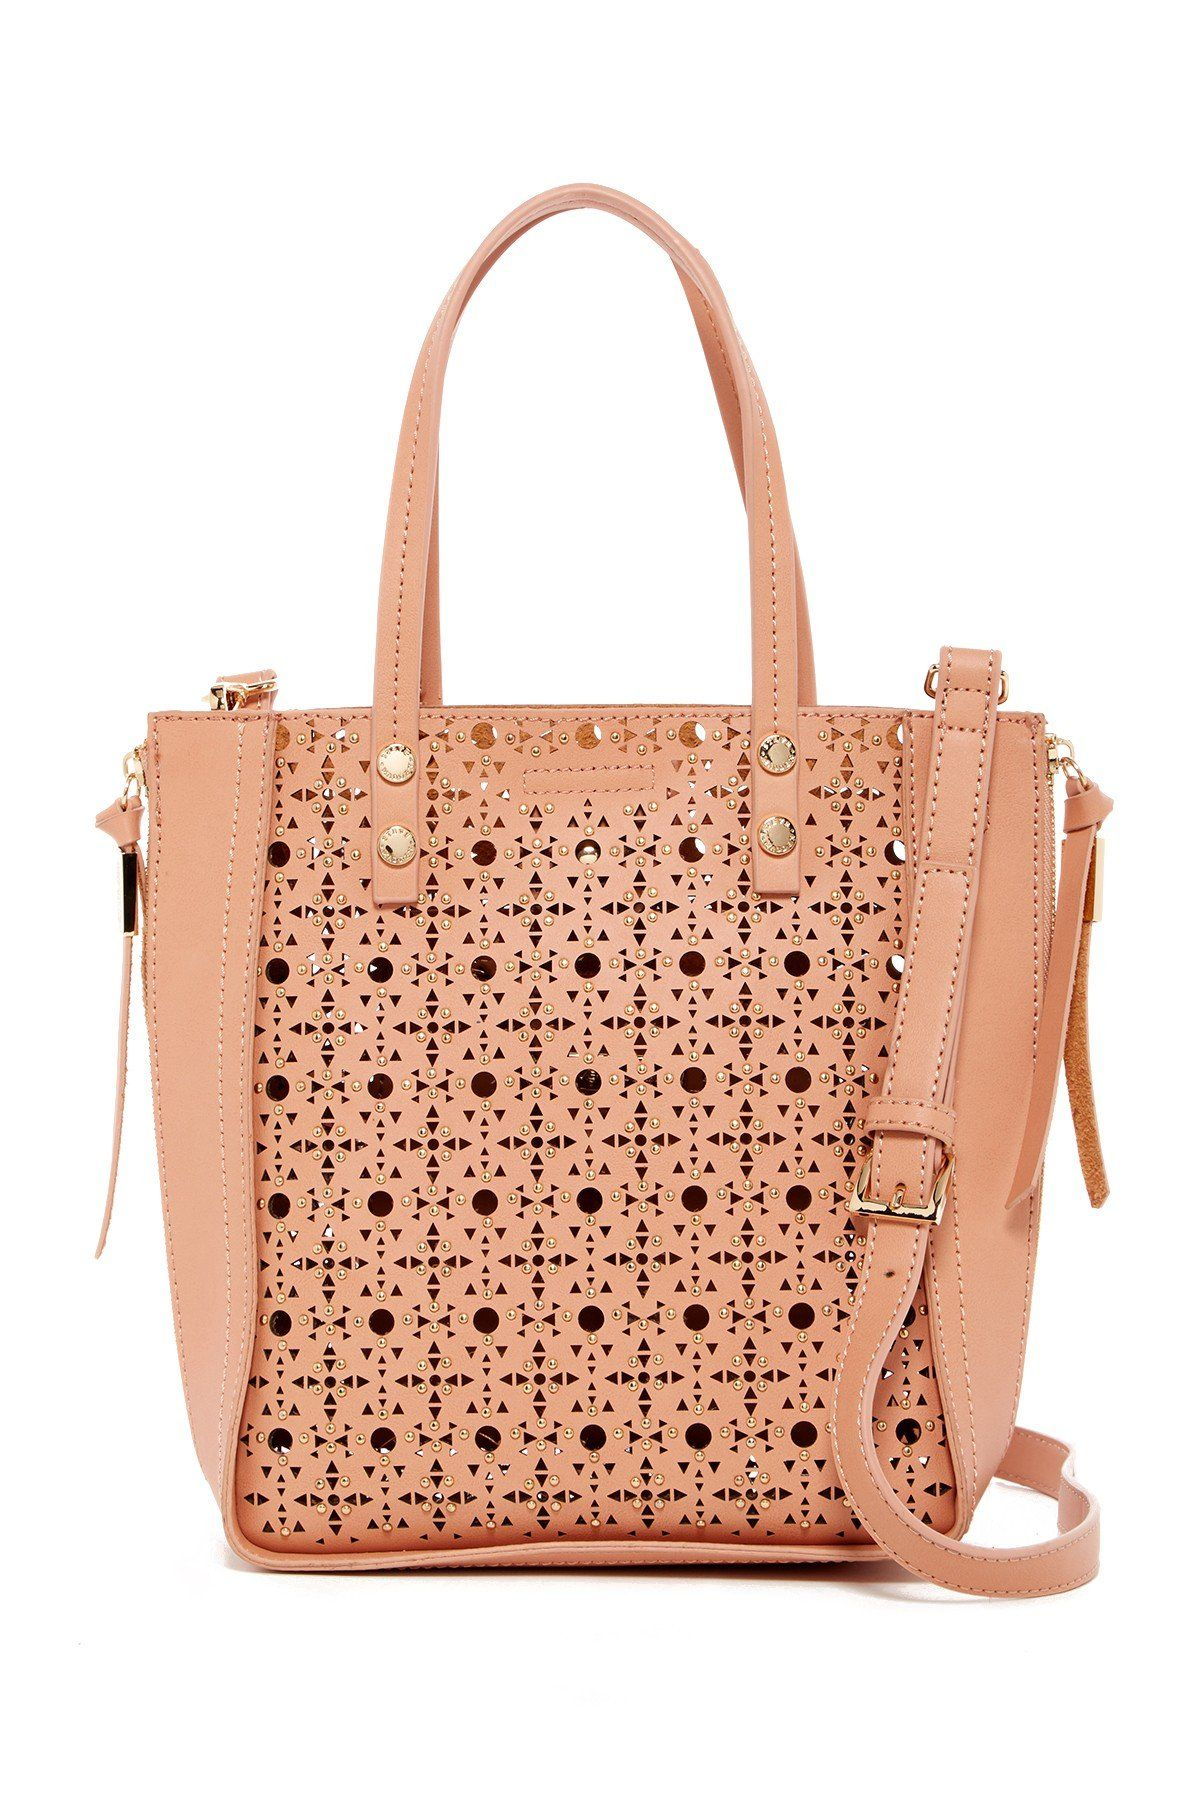 0a16634535 Tammy Small Shopper Stitch Fix Brands